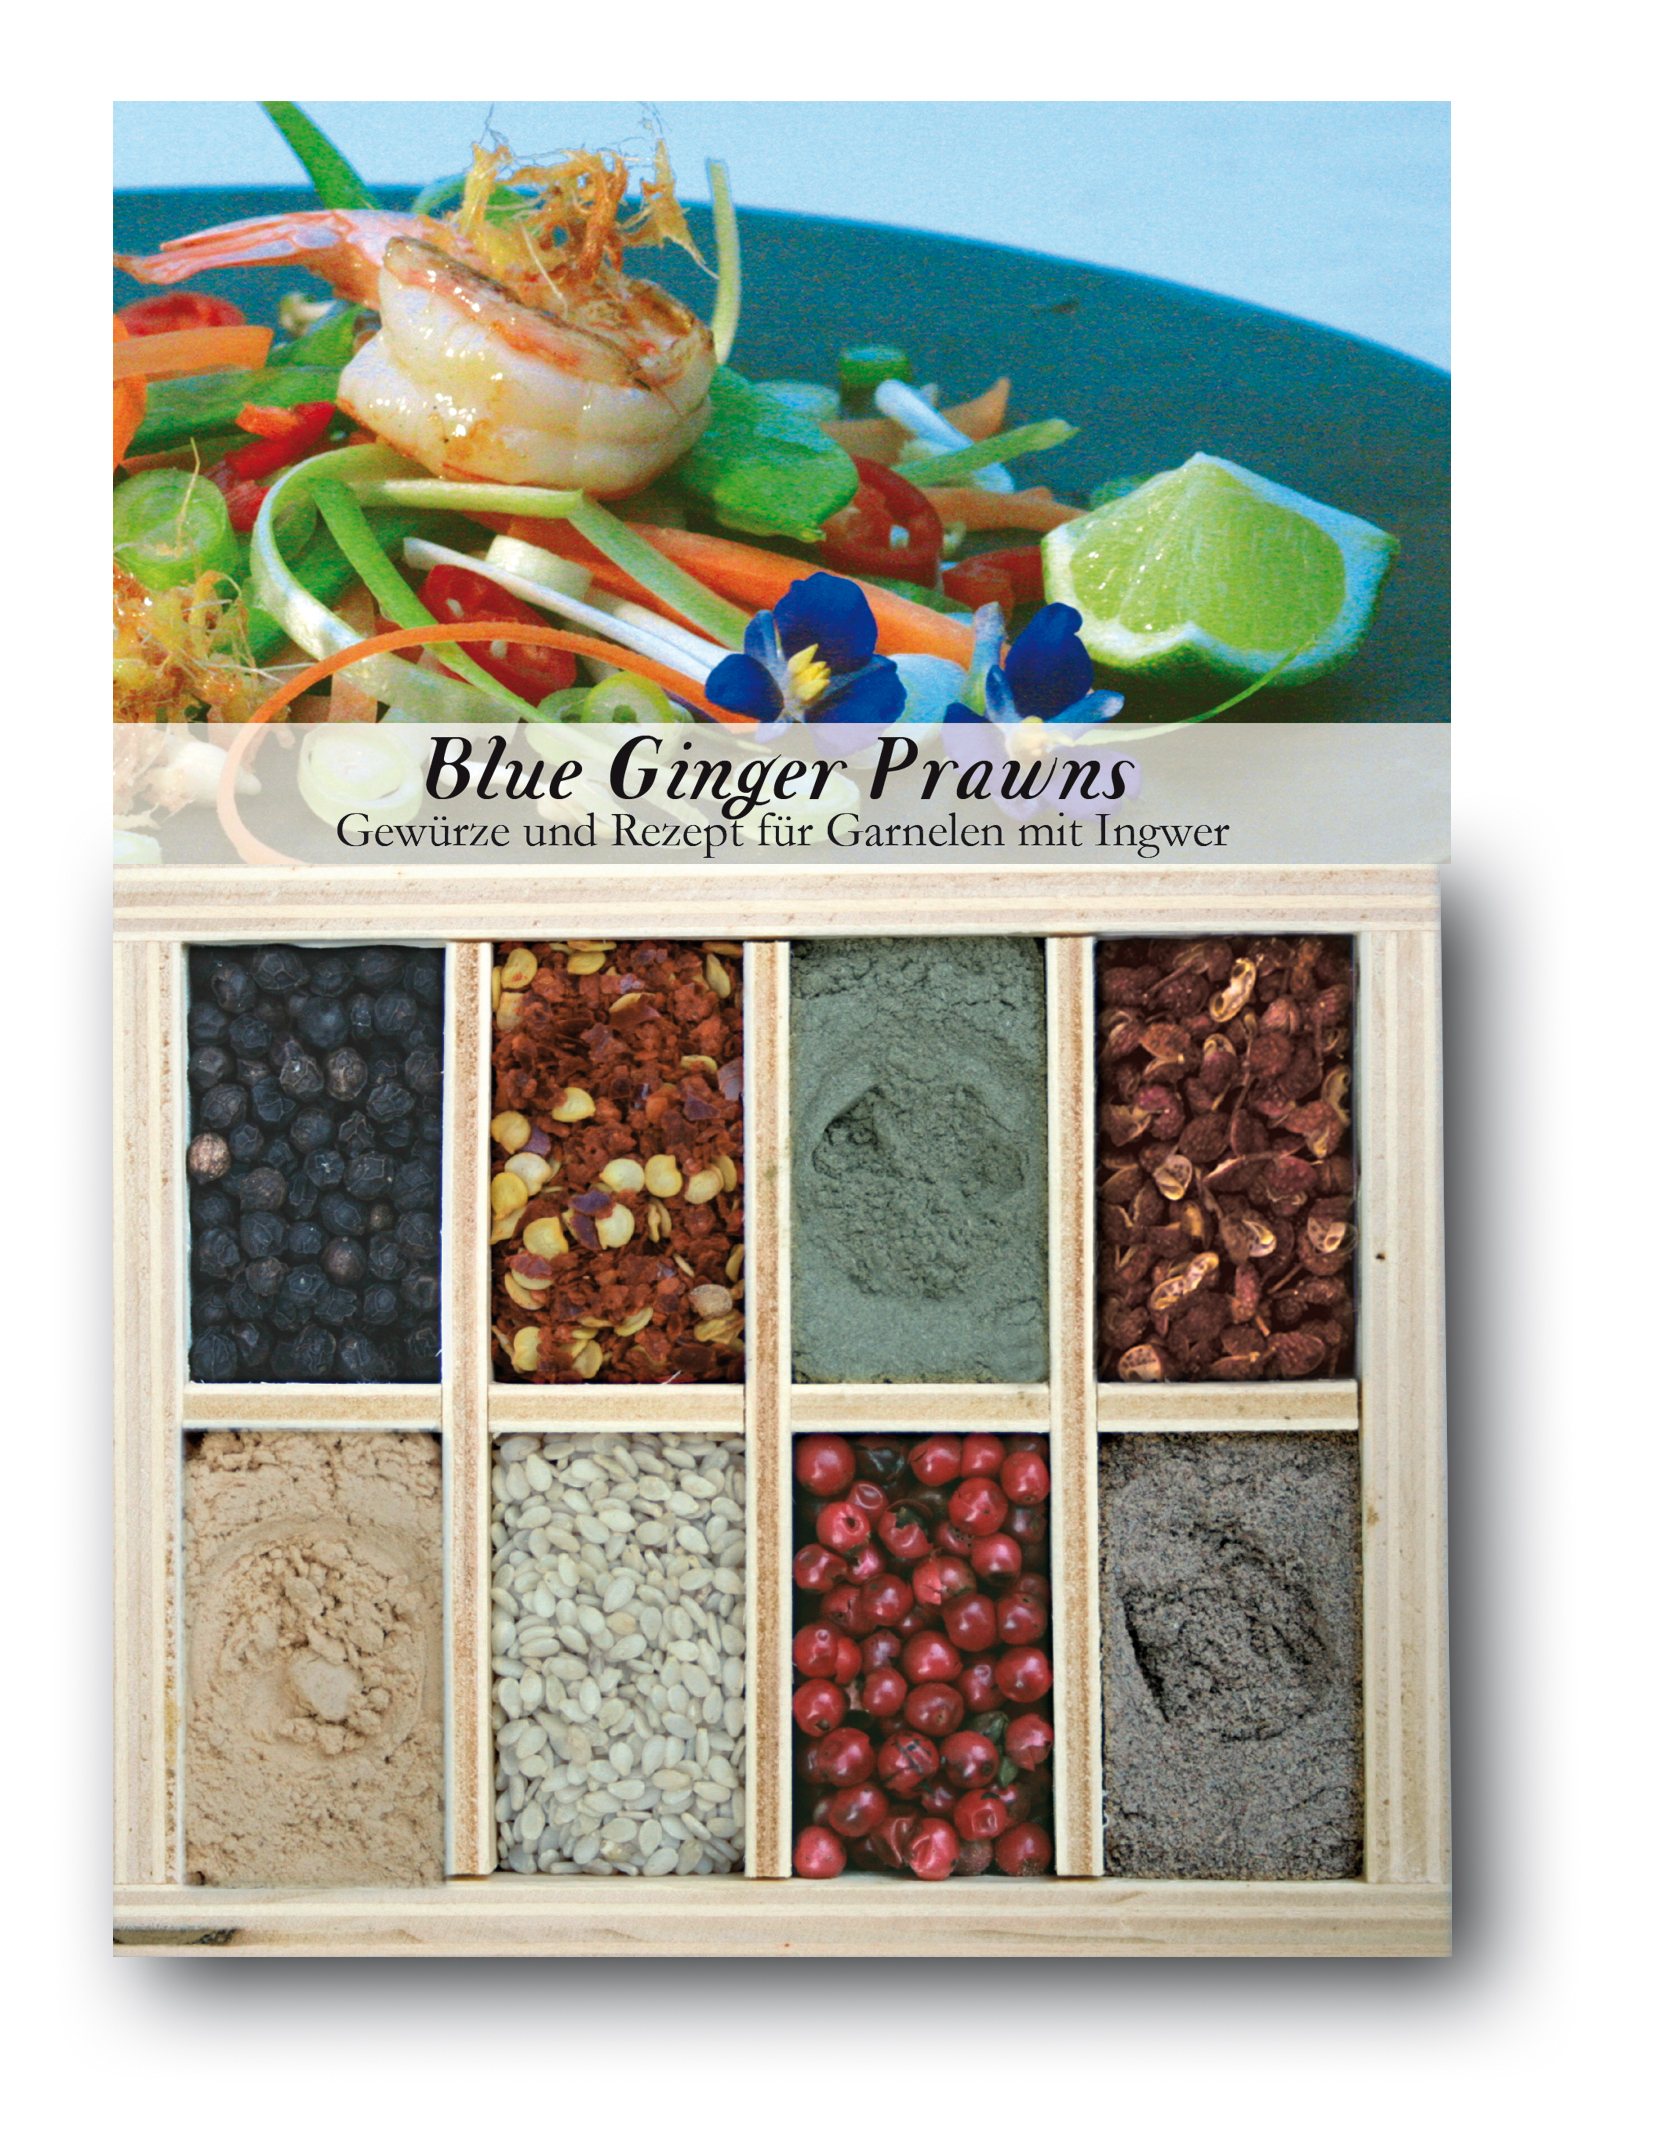 Blue Ginger Prawns